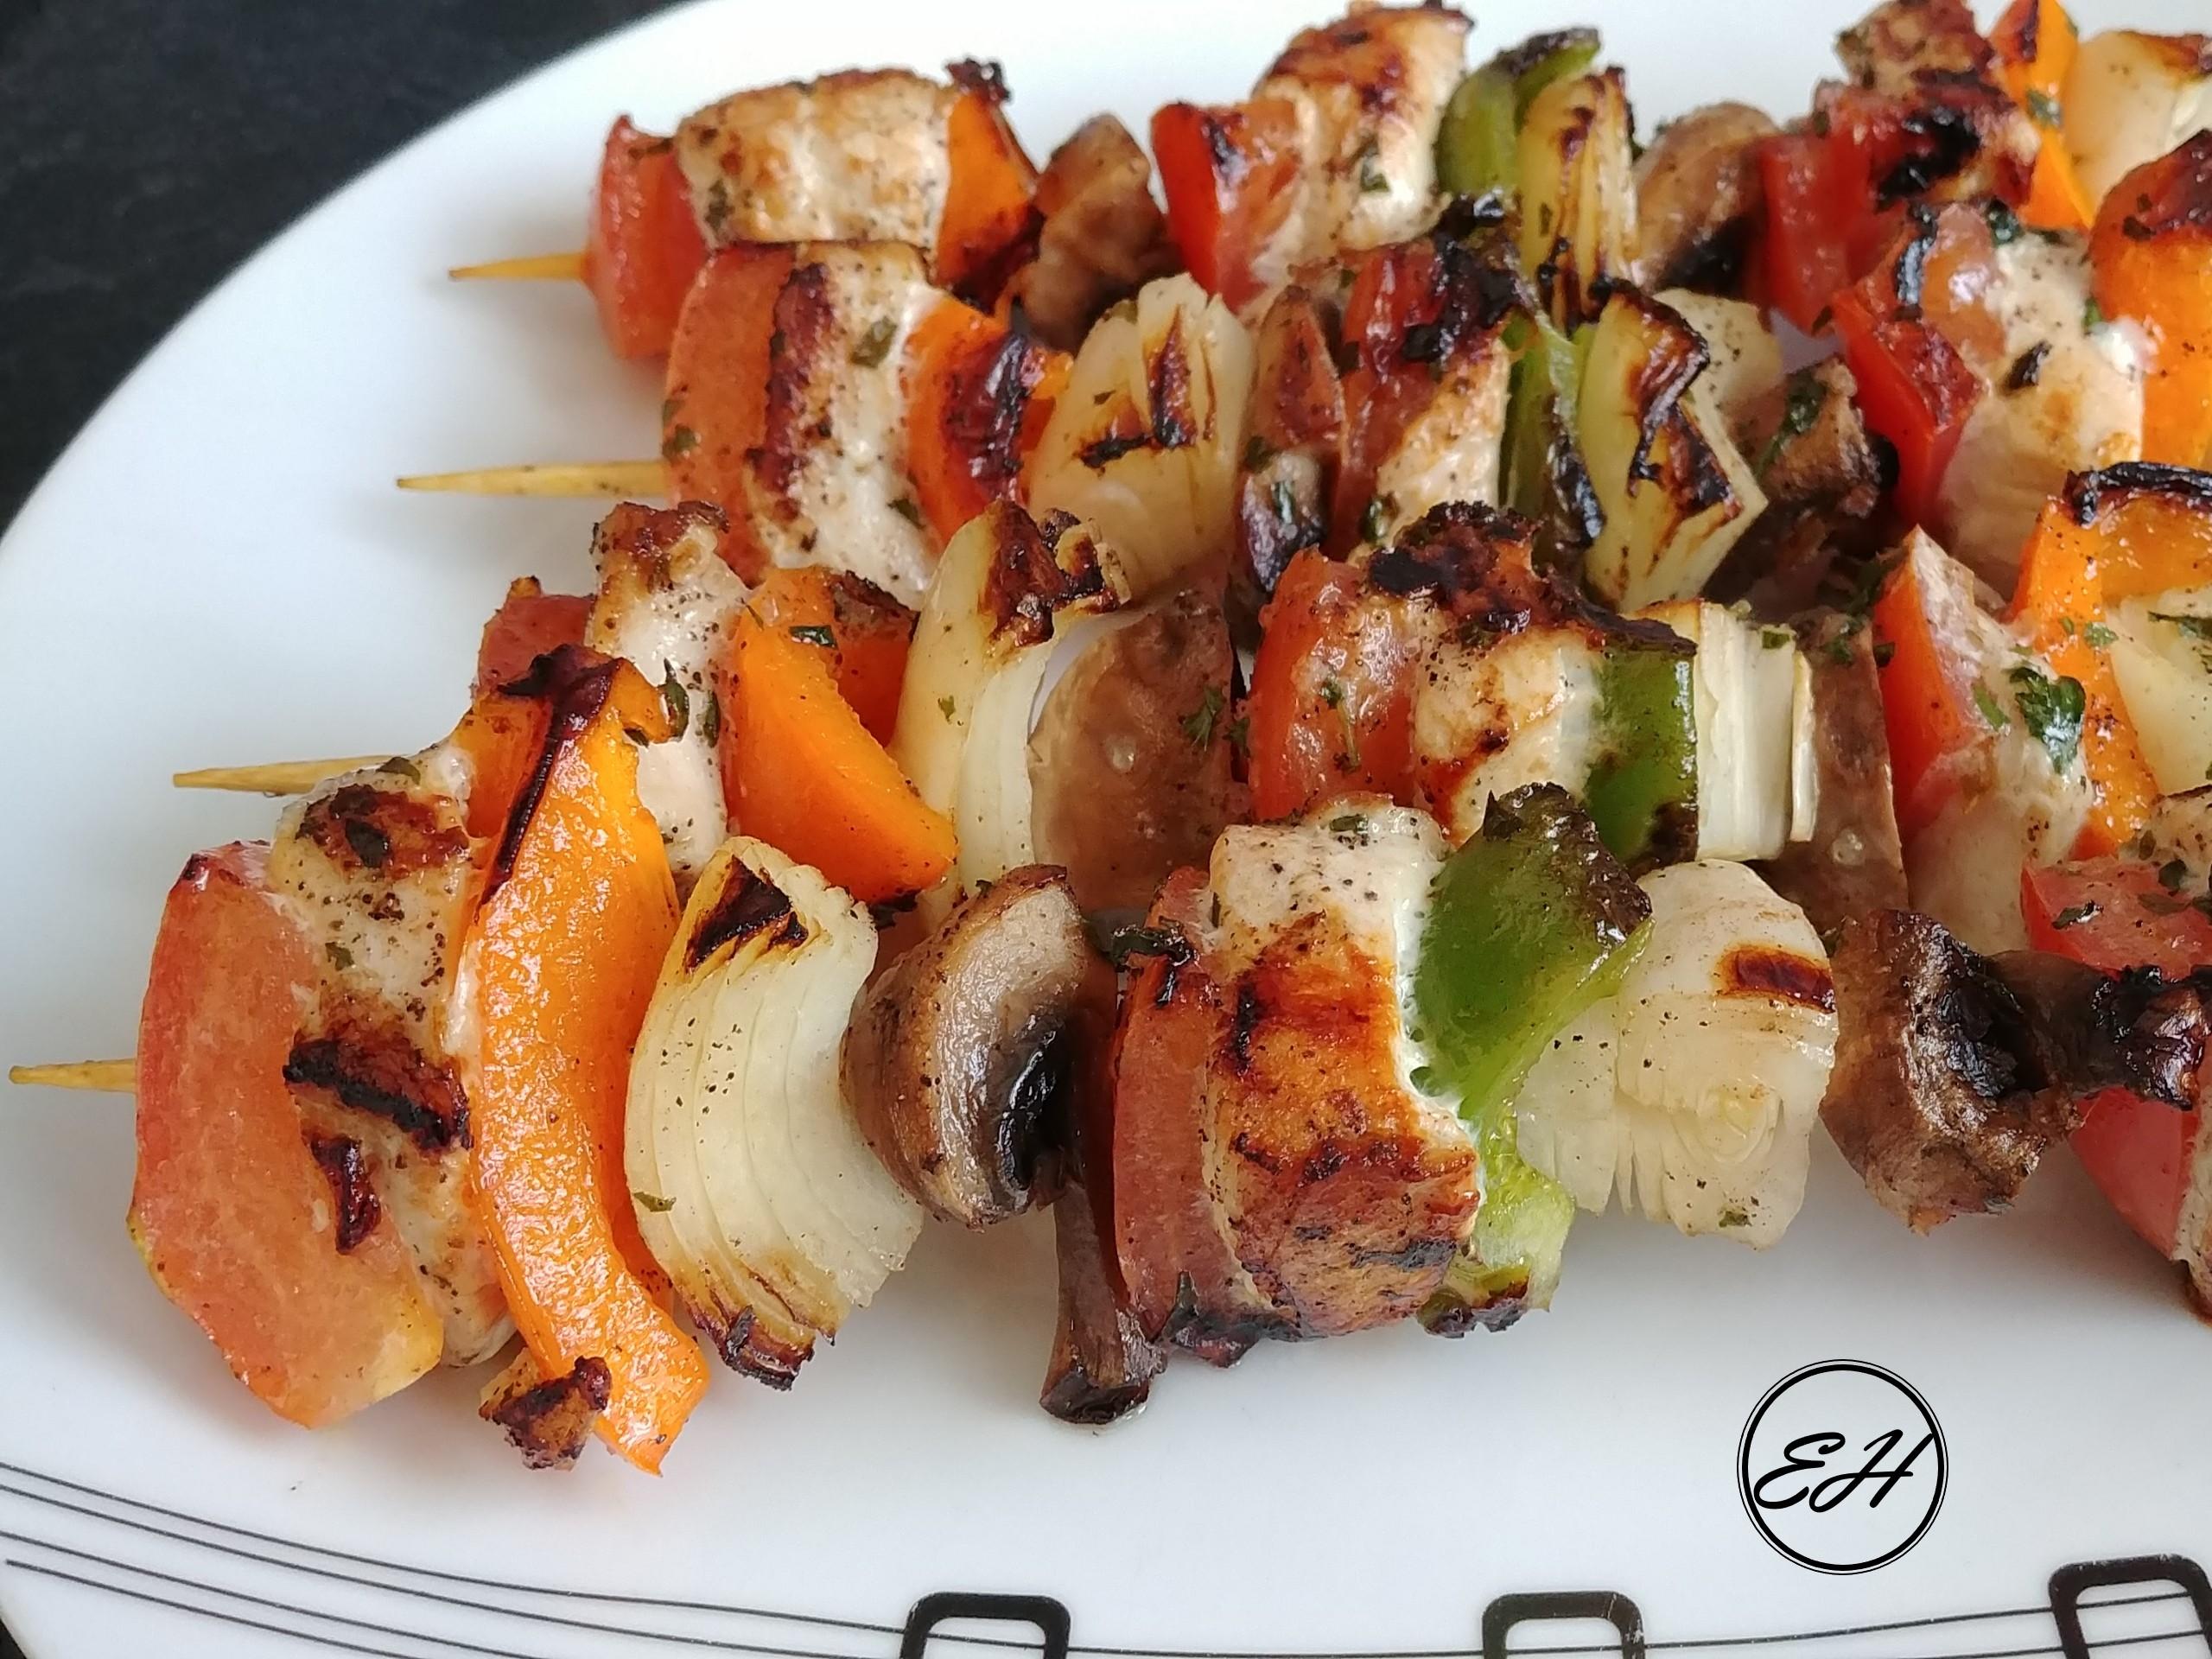 Chicken skewers - Extravagance House